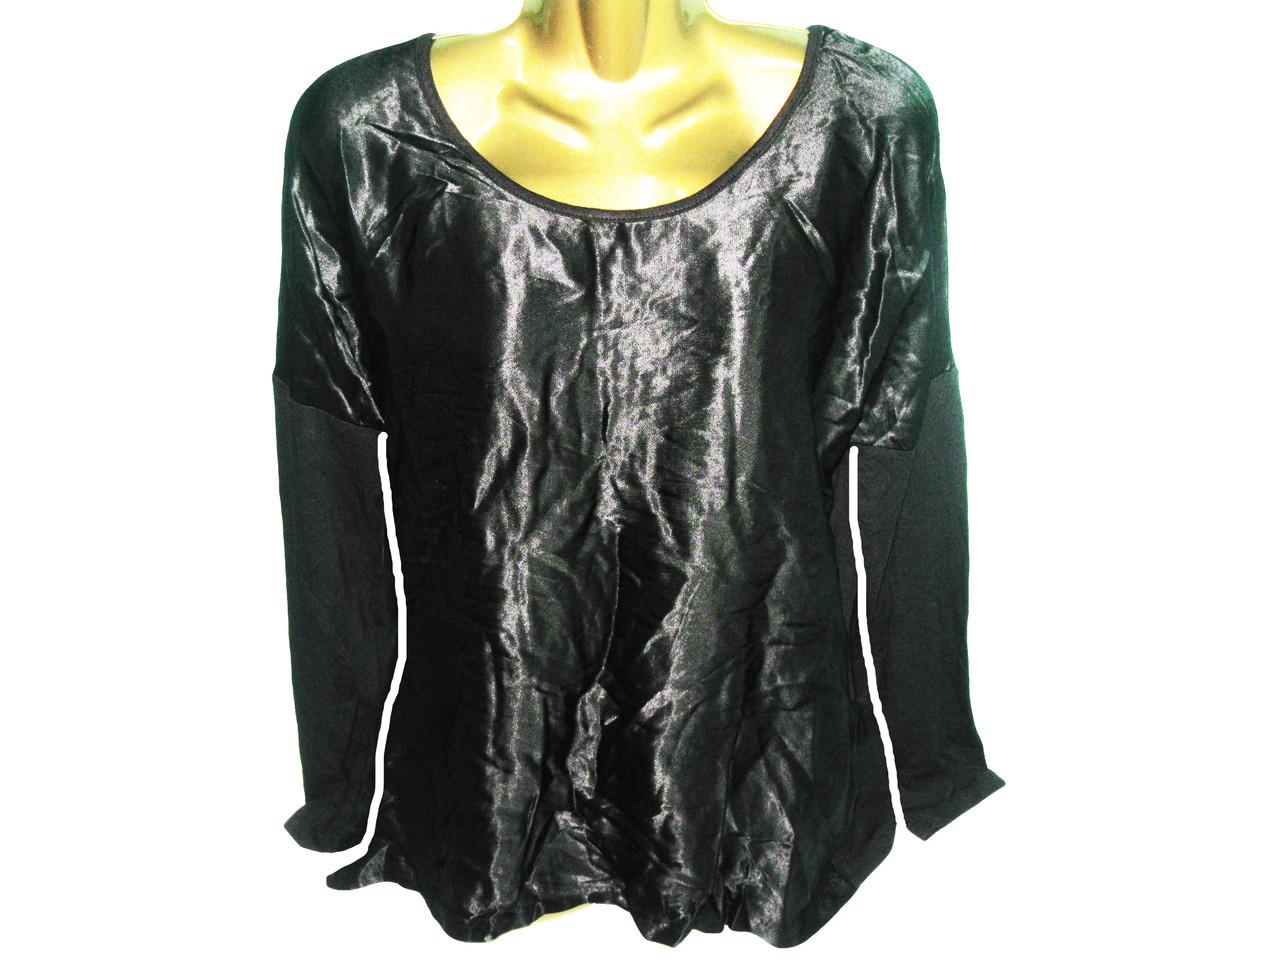 Блузка женская, ESMARA, размер L, арт. Ж-050